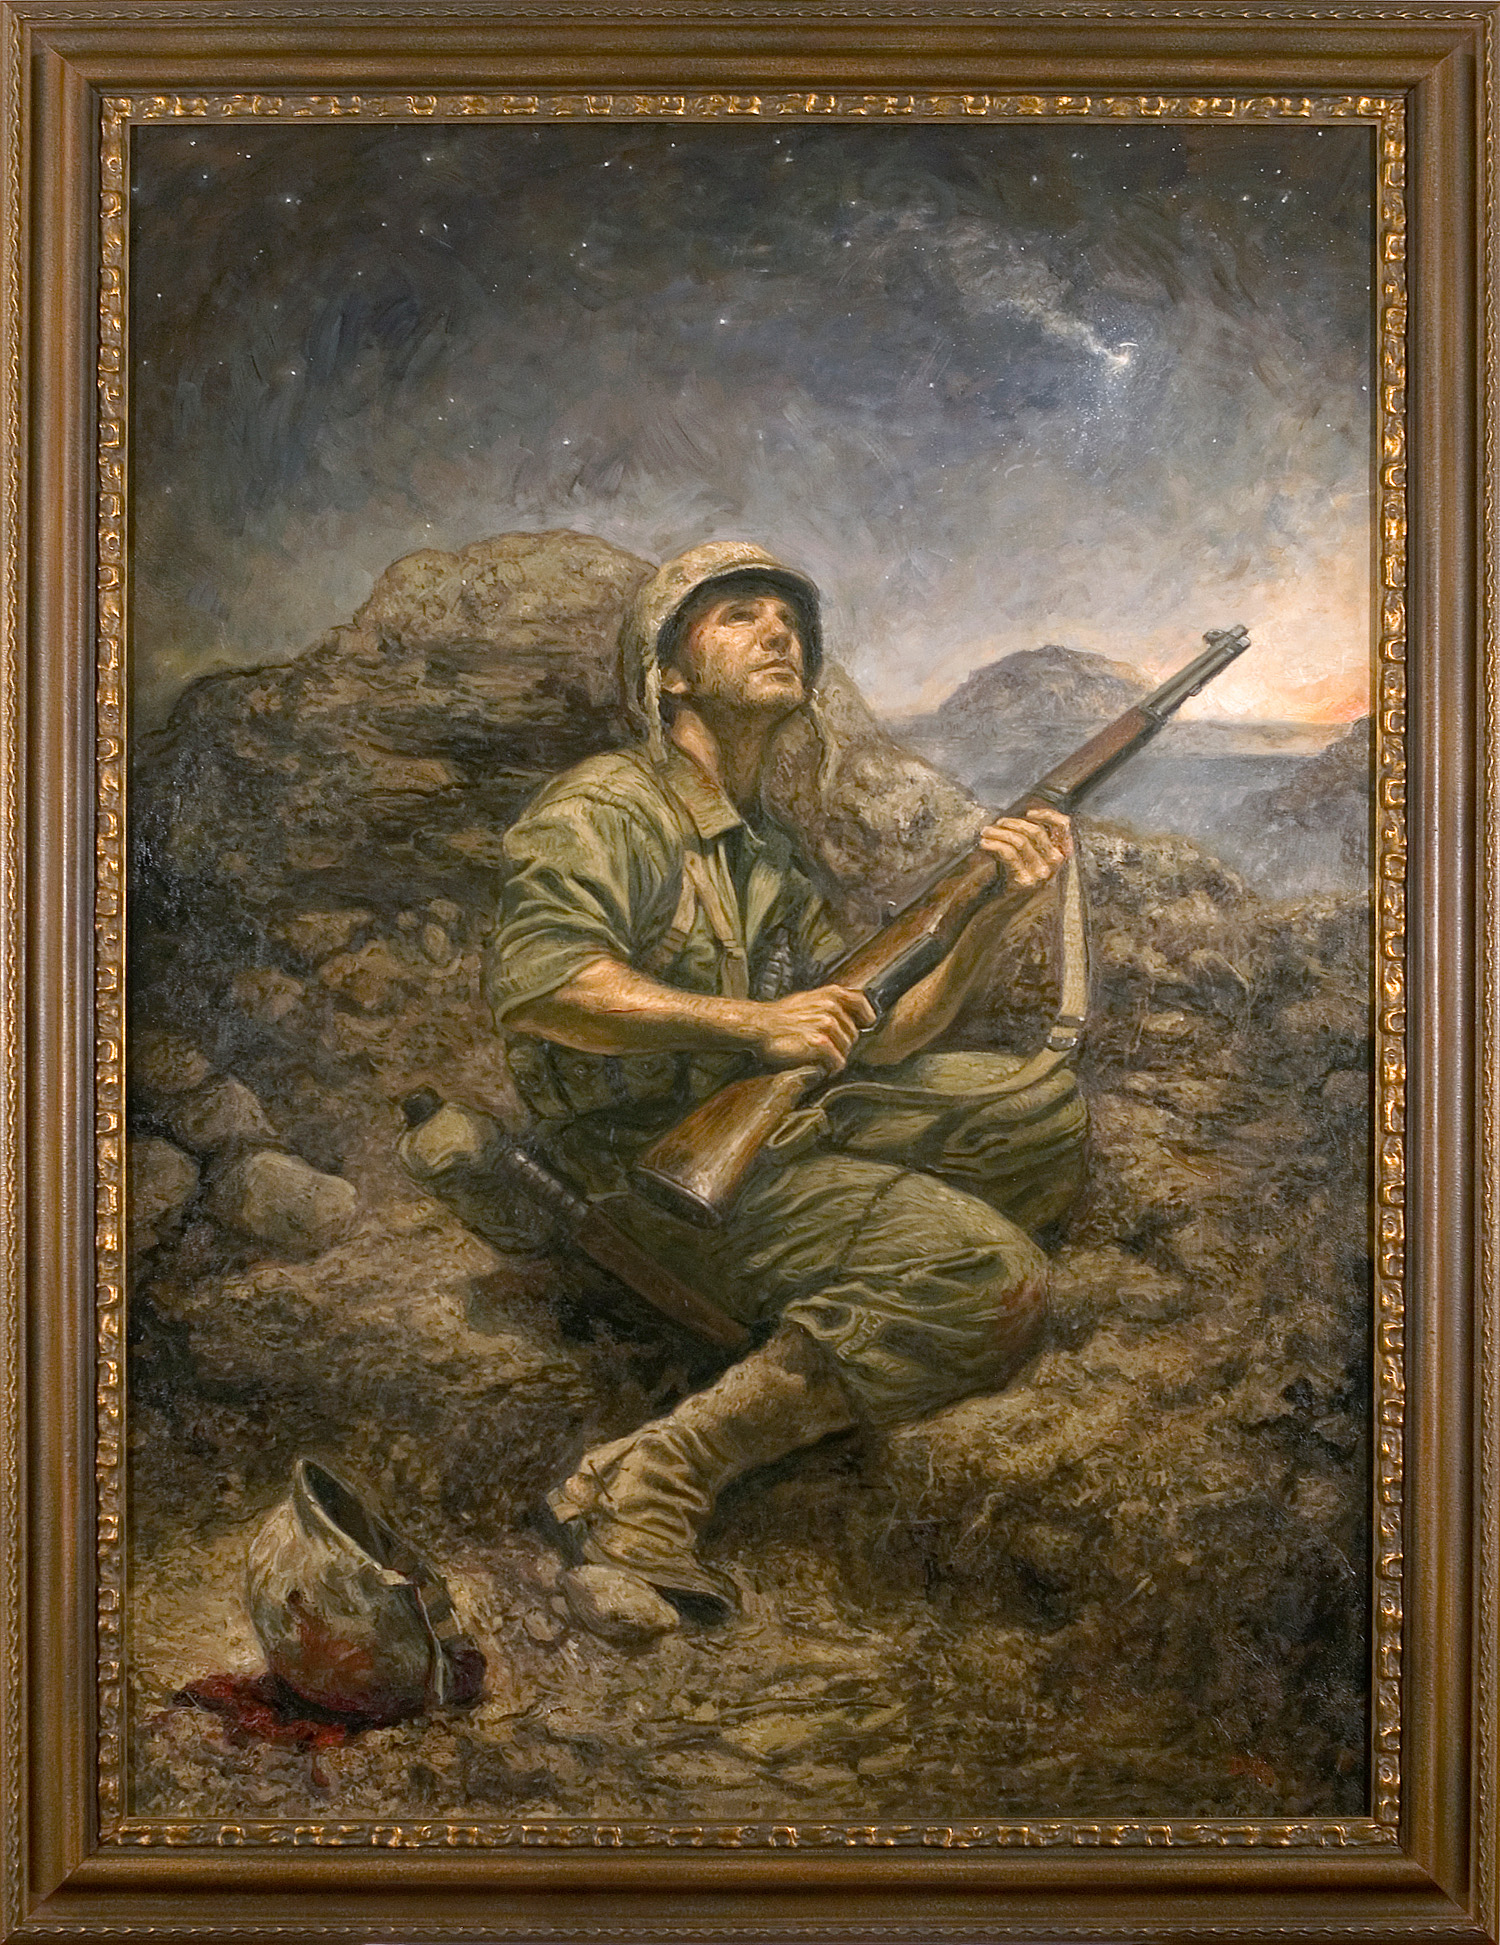 Honoring The Spirit Iwo Jima Painting Framed Large.jpg